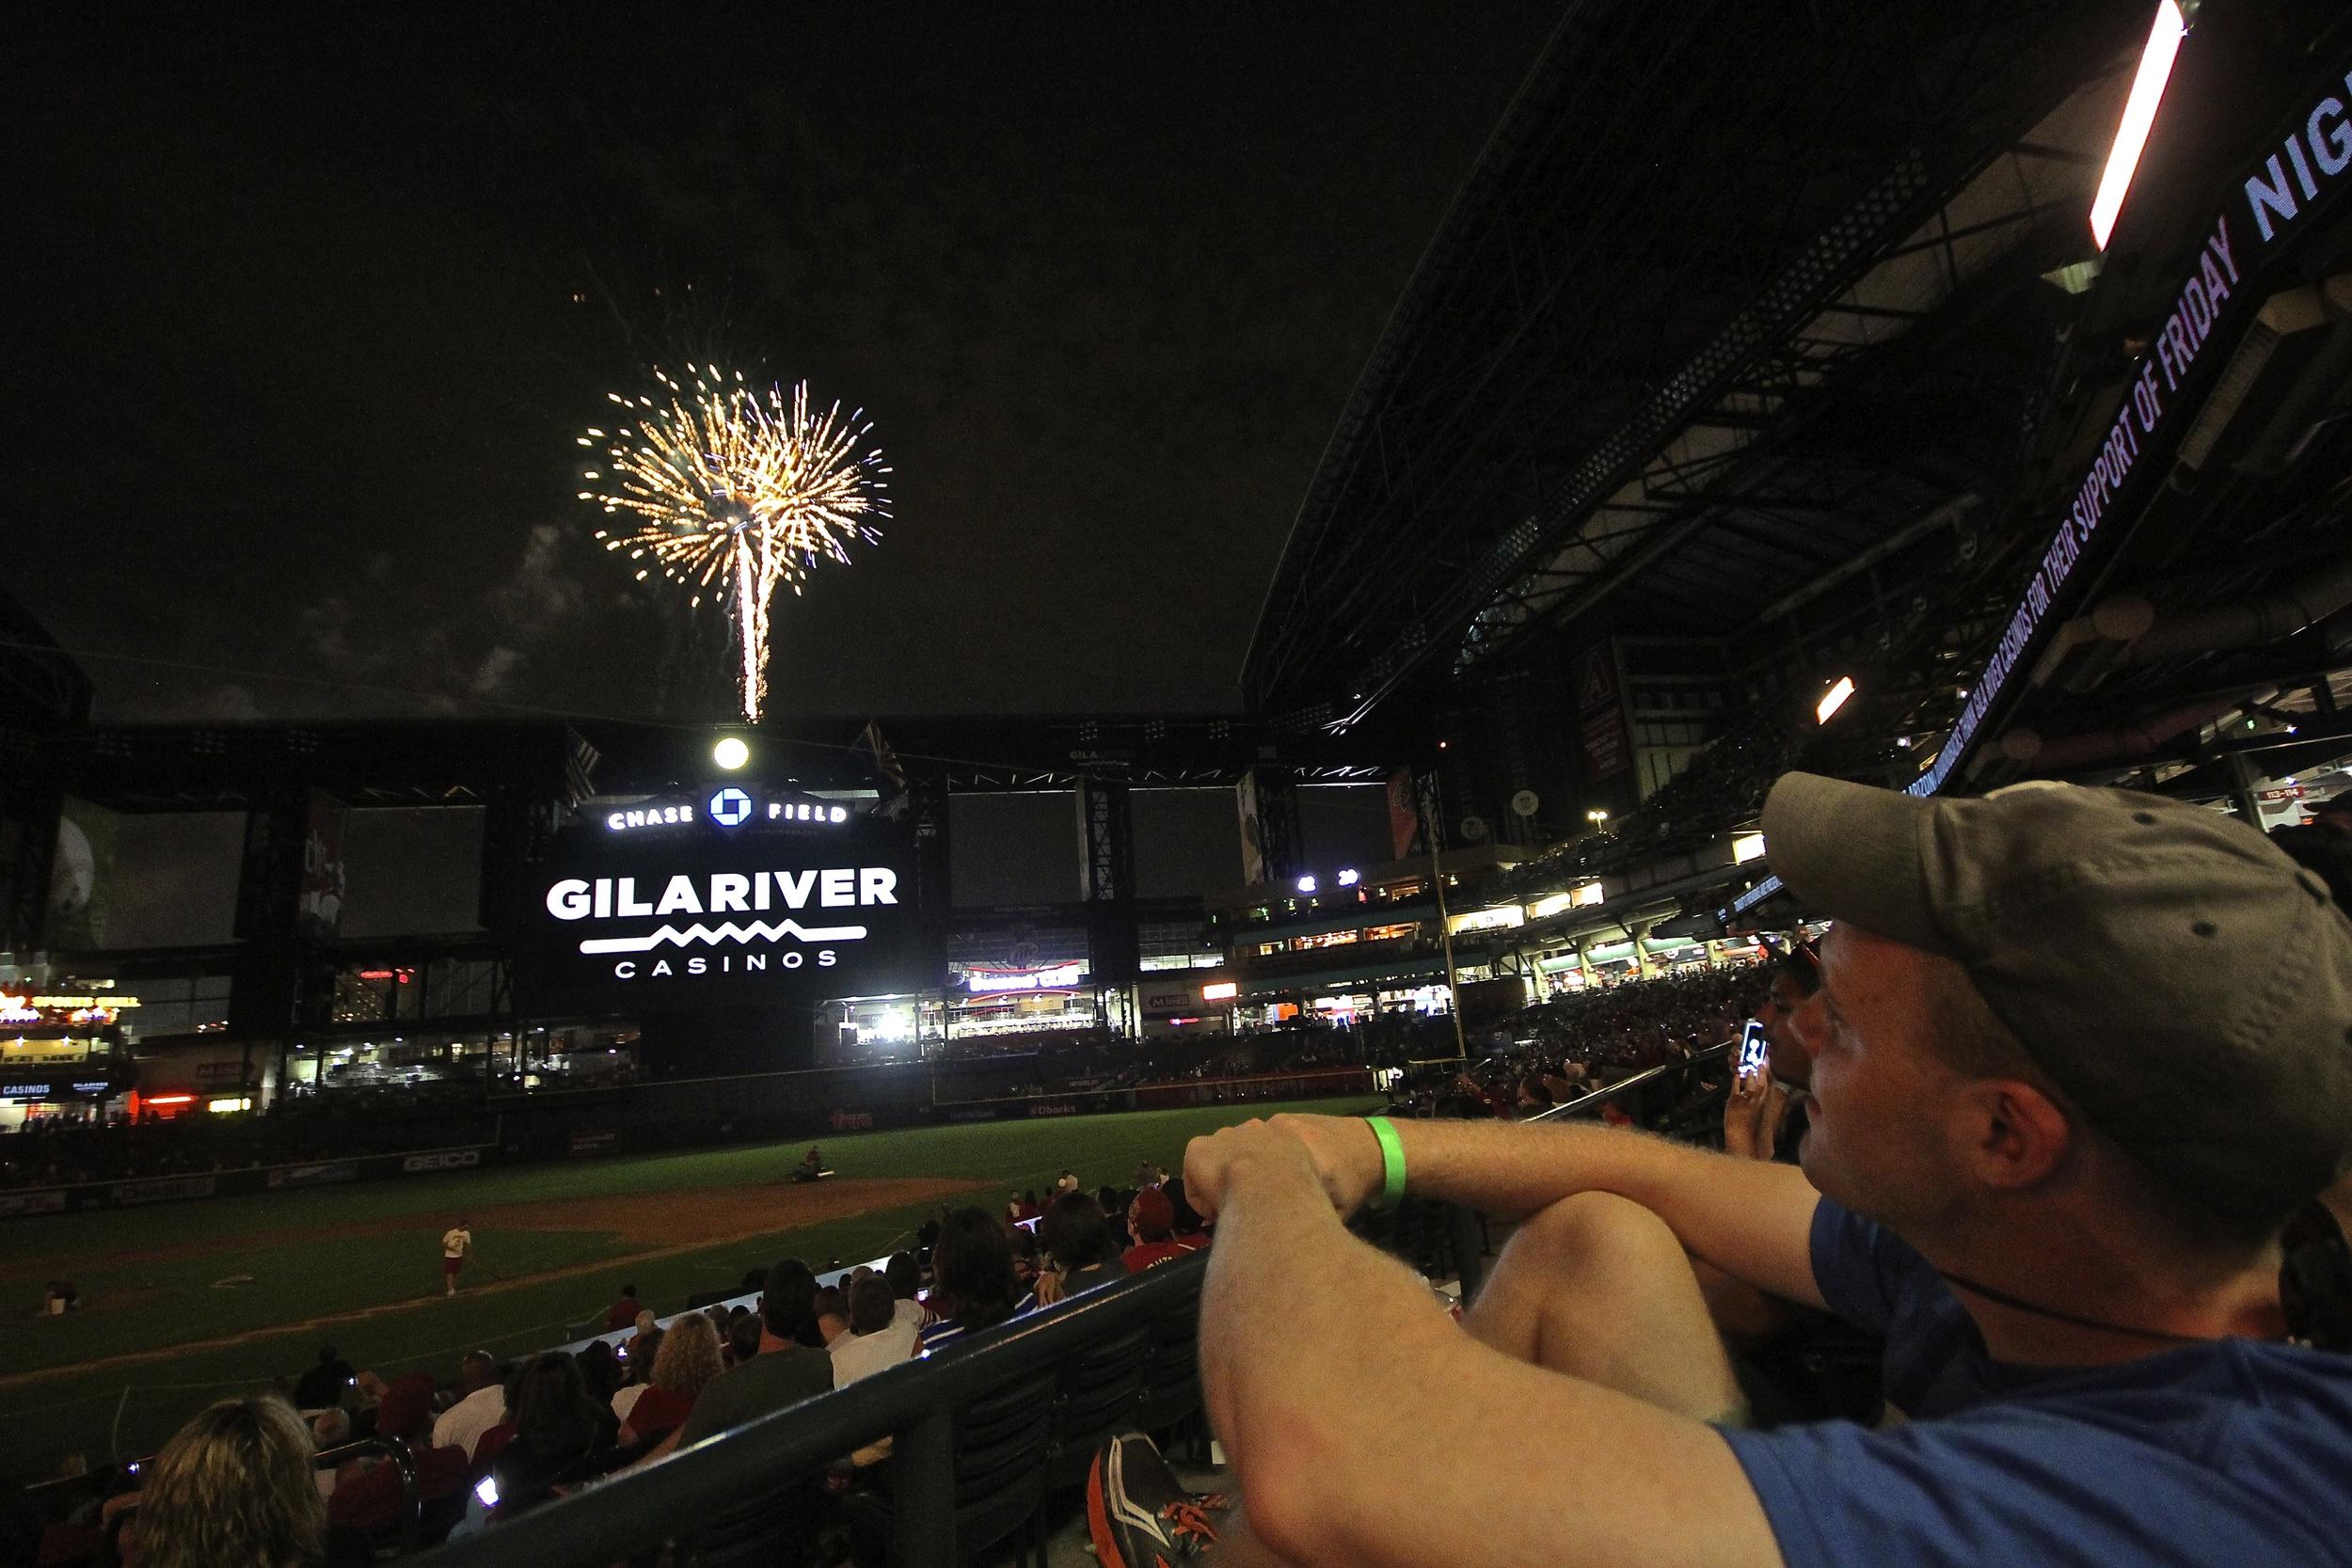 My buddy Rindler enjoying the fireworks